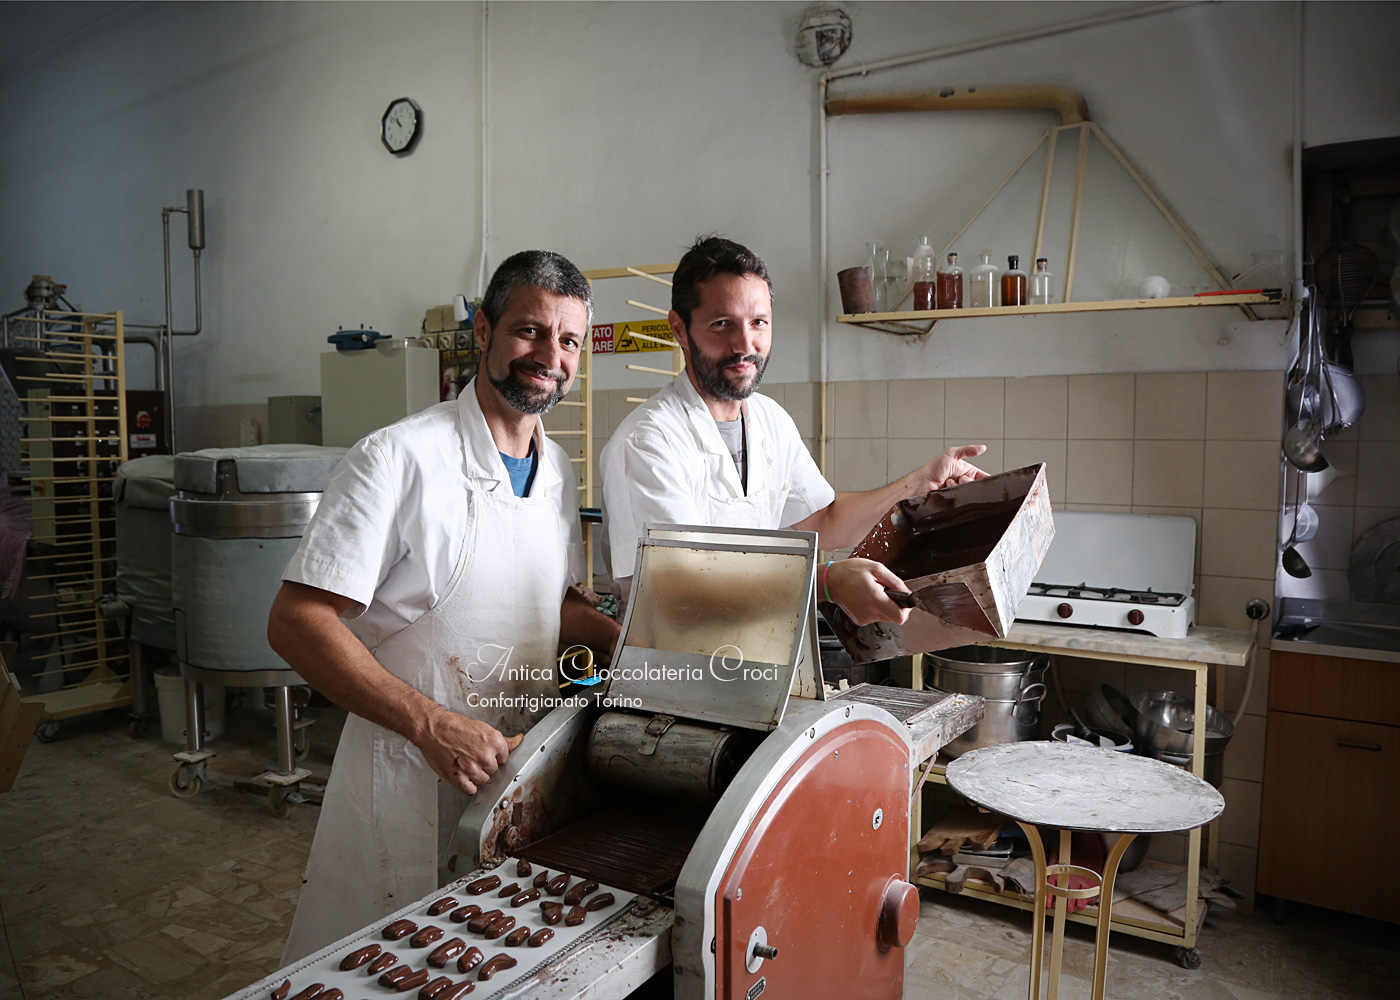 Antica cioccolateria Croci